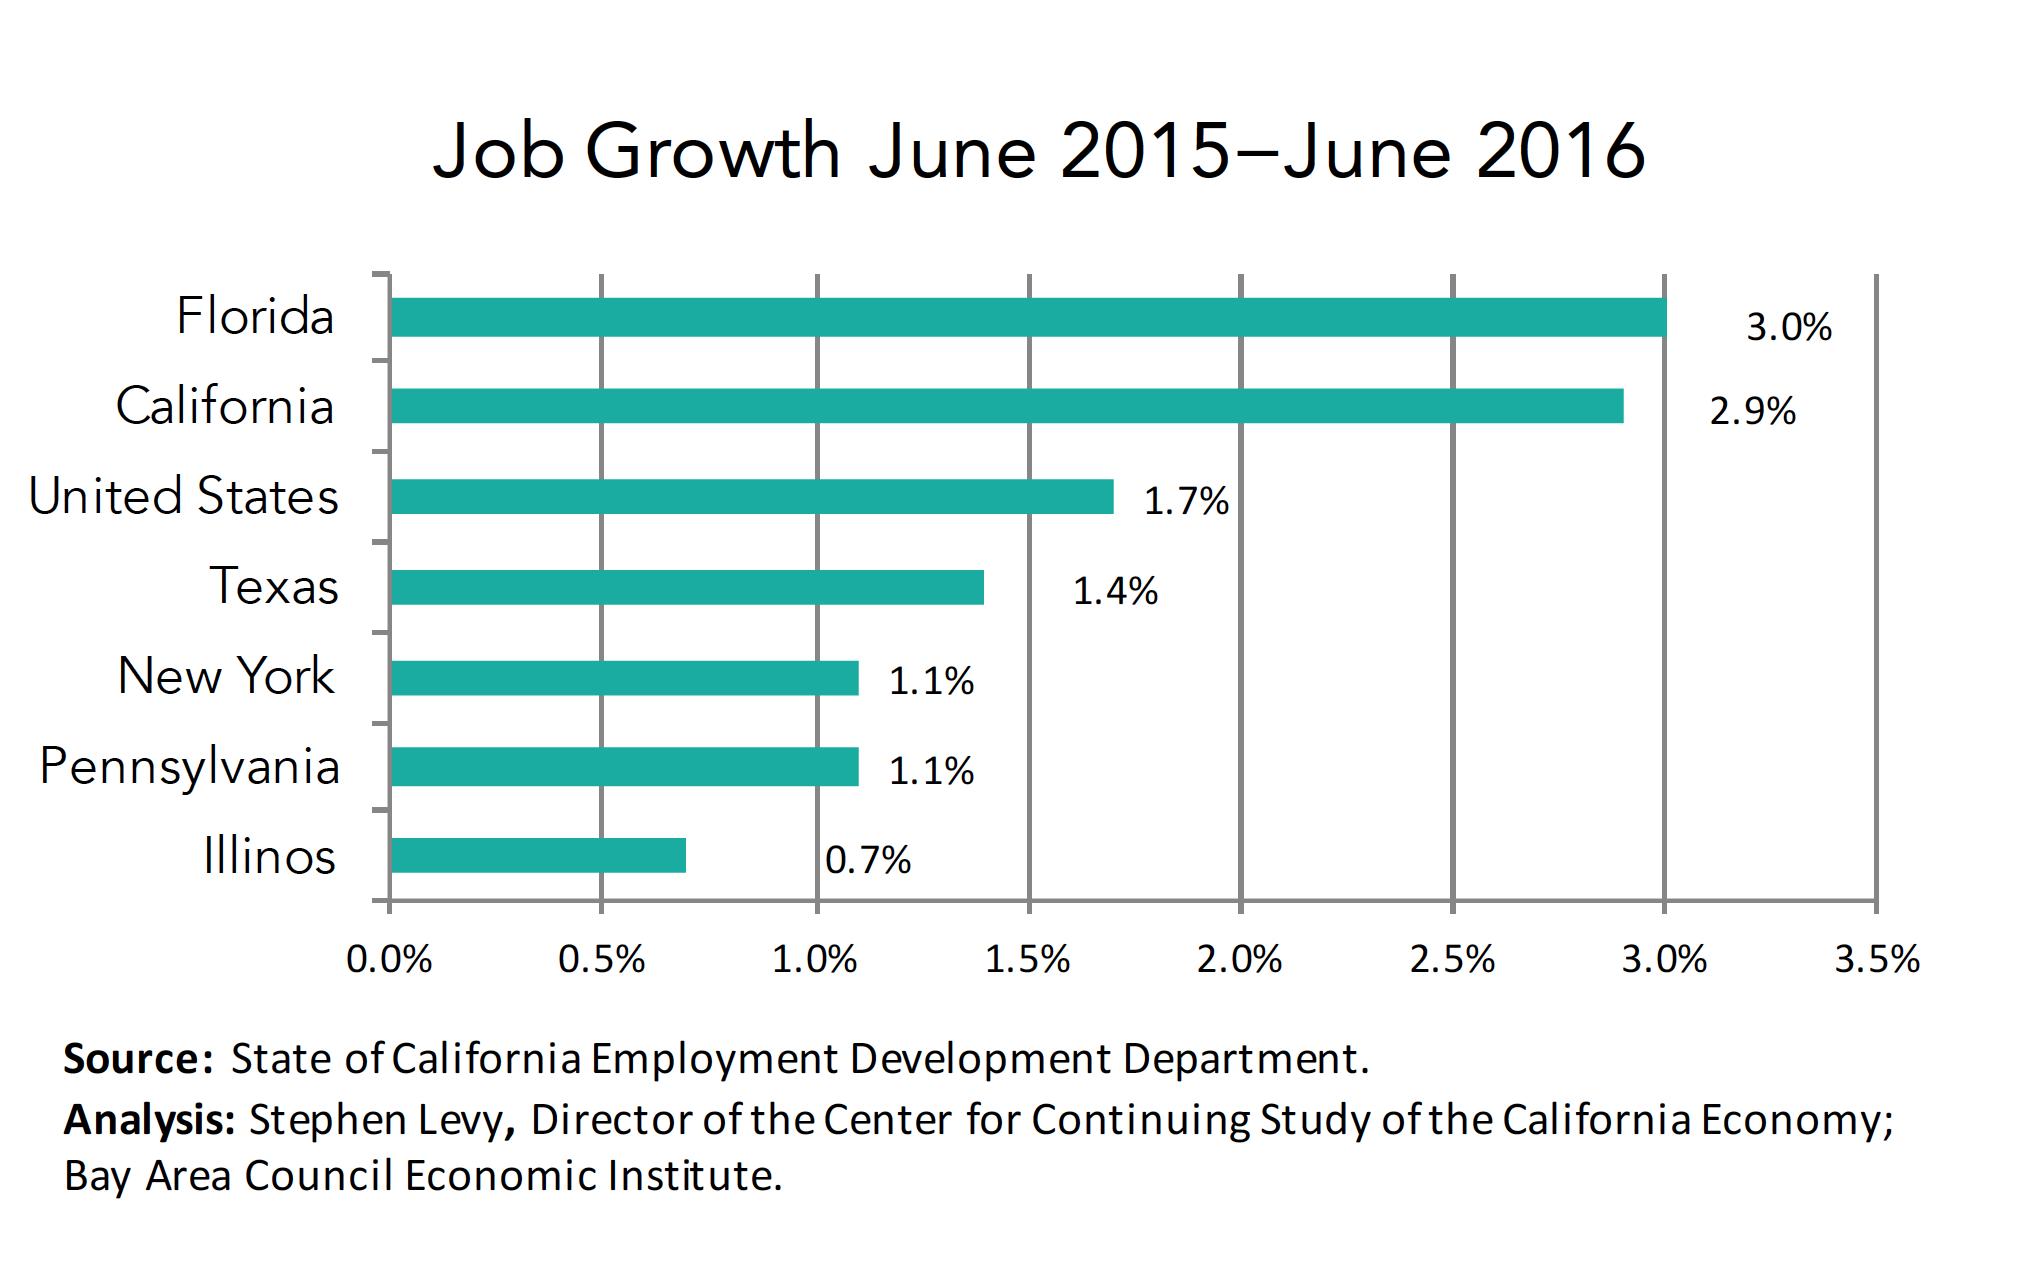 Job Growth - States